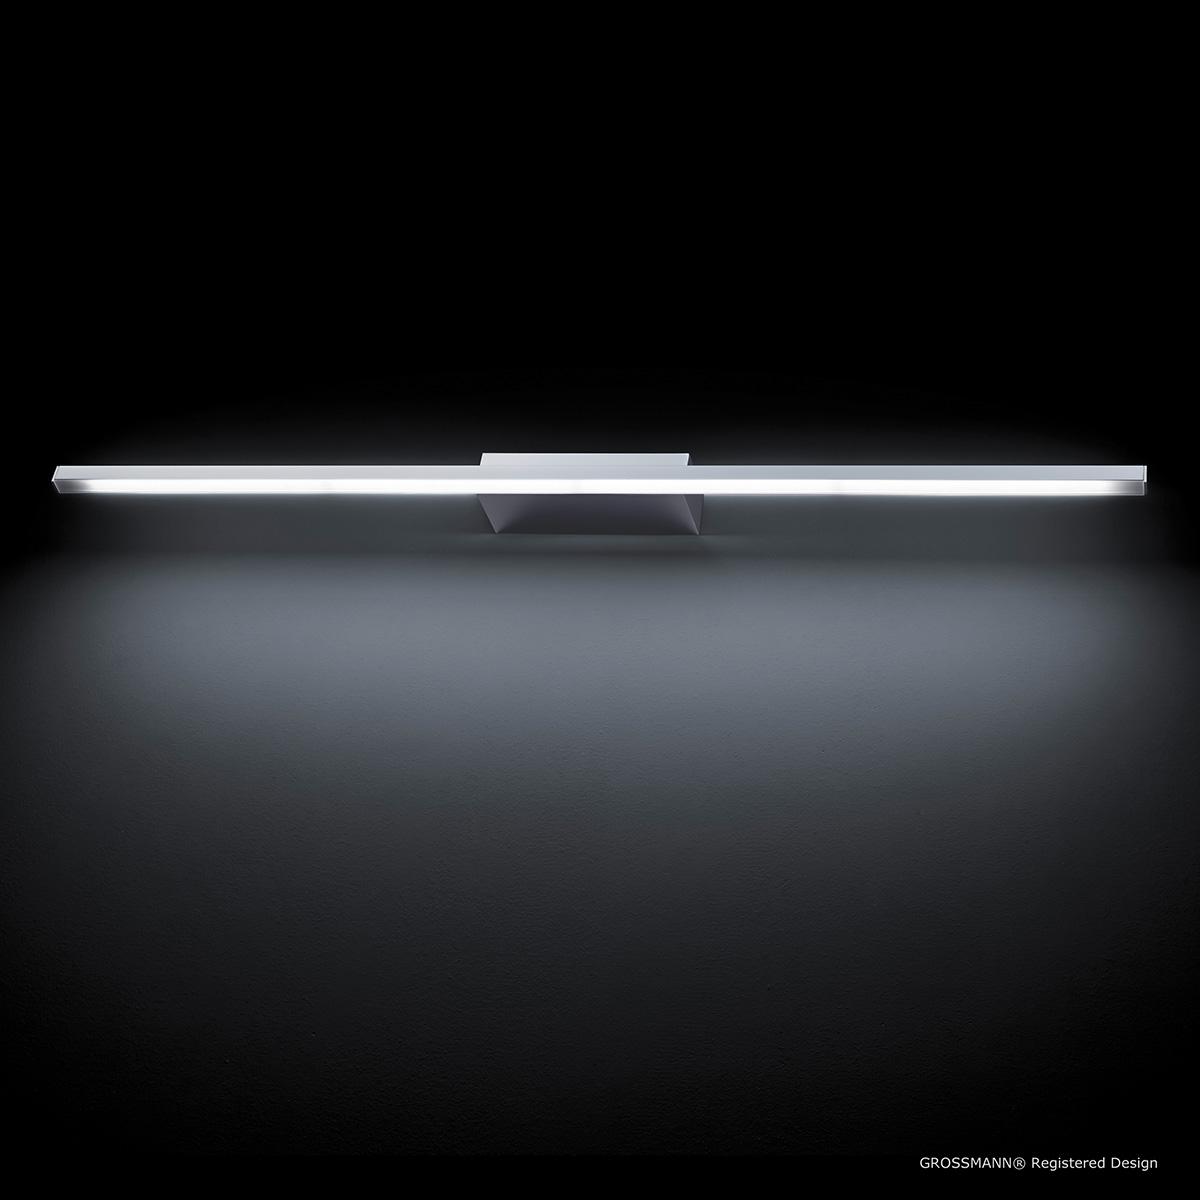 Grossmann Forte LED Wandleuchte 54-763-064